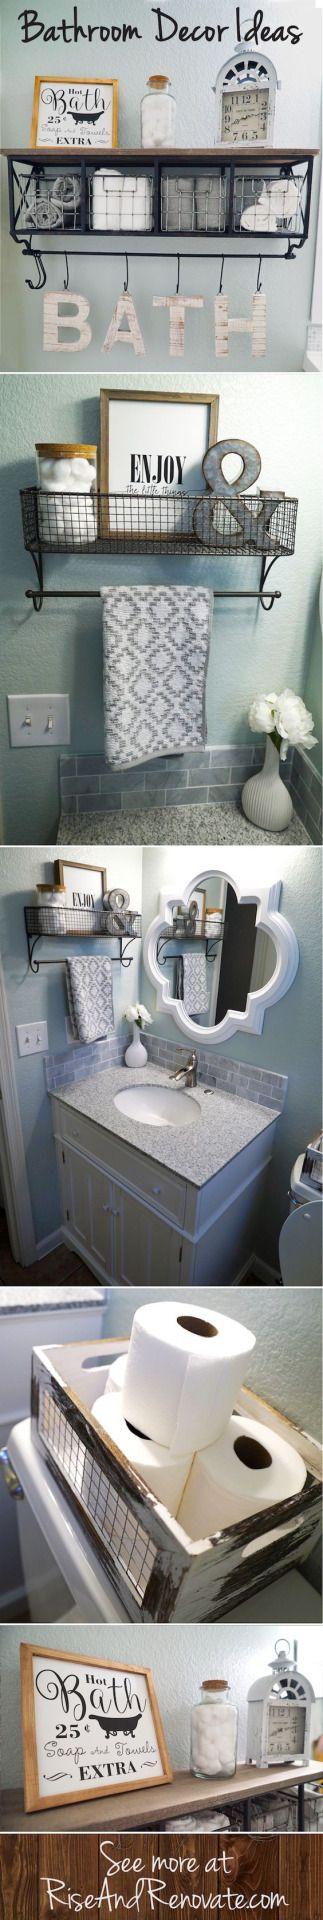 Best Sea Bathroom Decor Ideas On Pinterest Ocean Bathroom - Sea bathroom decor for small bathroom ideas